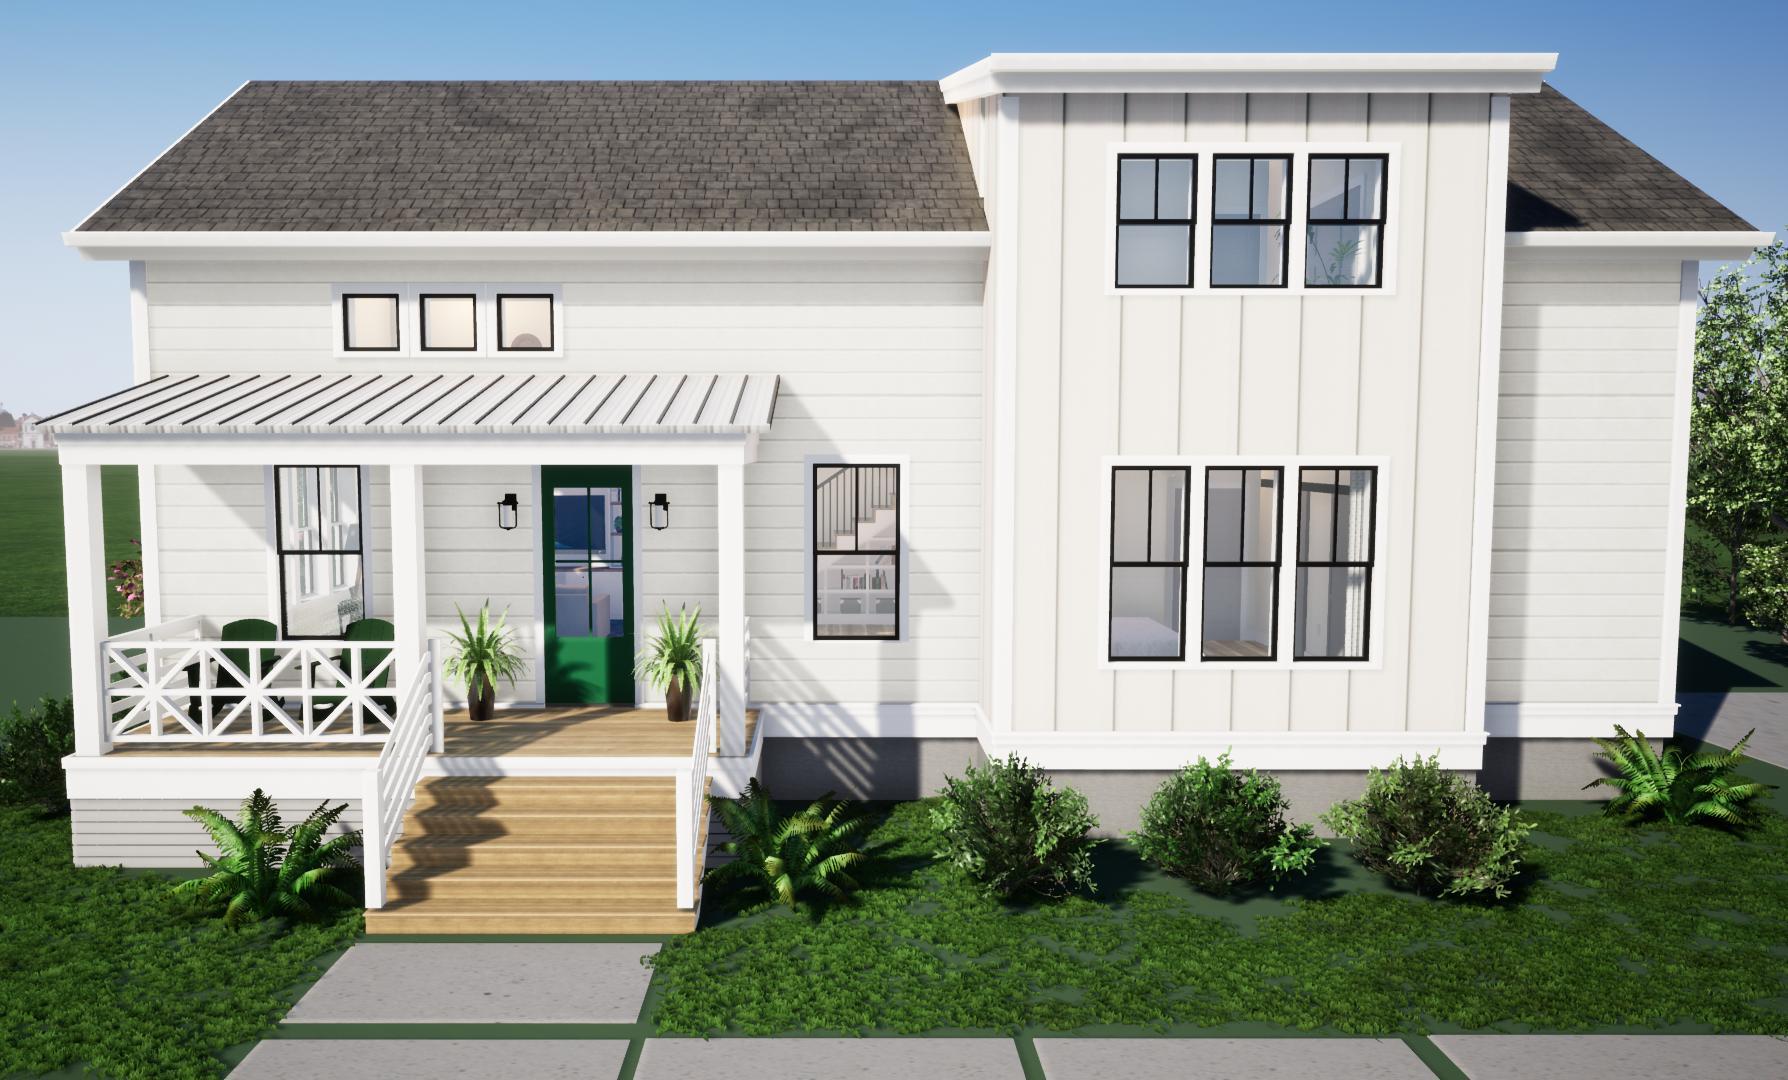 Ashley Forest Homes For Sale - 2 Live Oak, Charleston, SC - 8